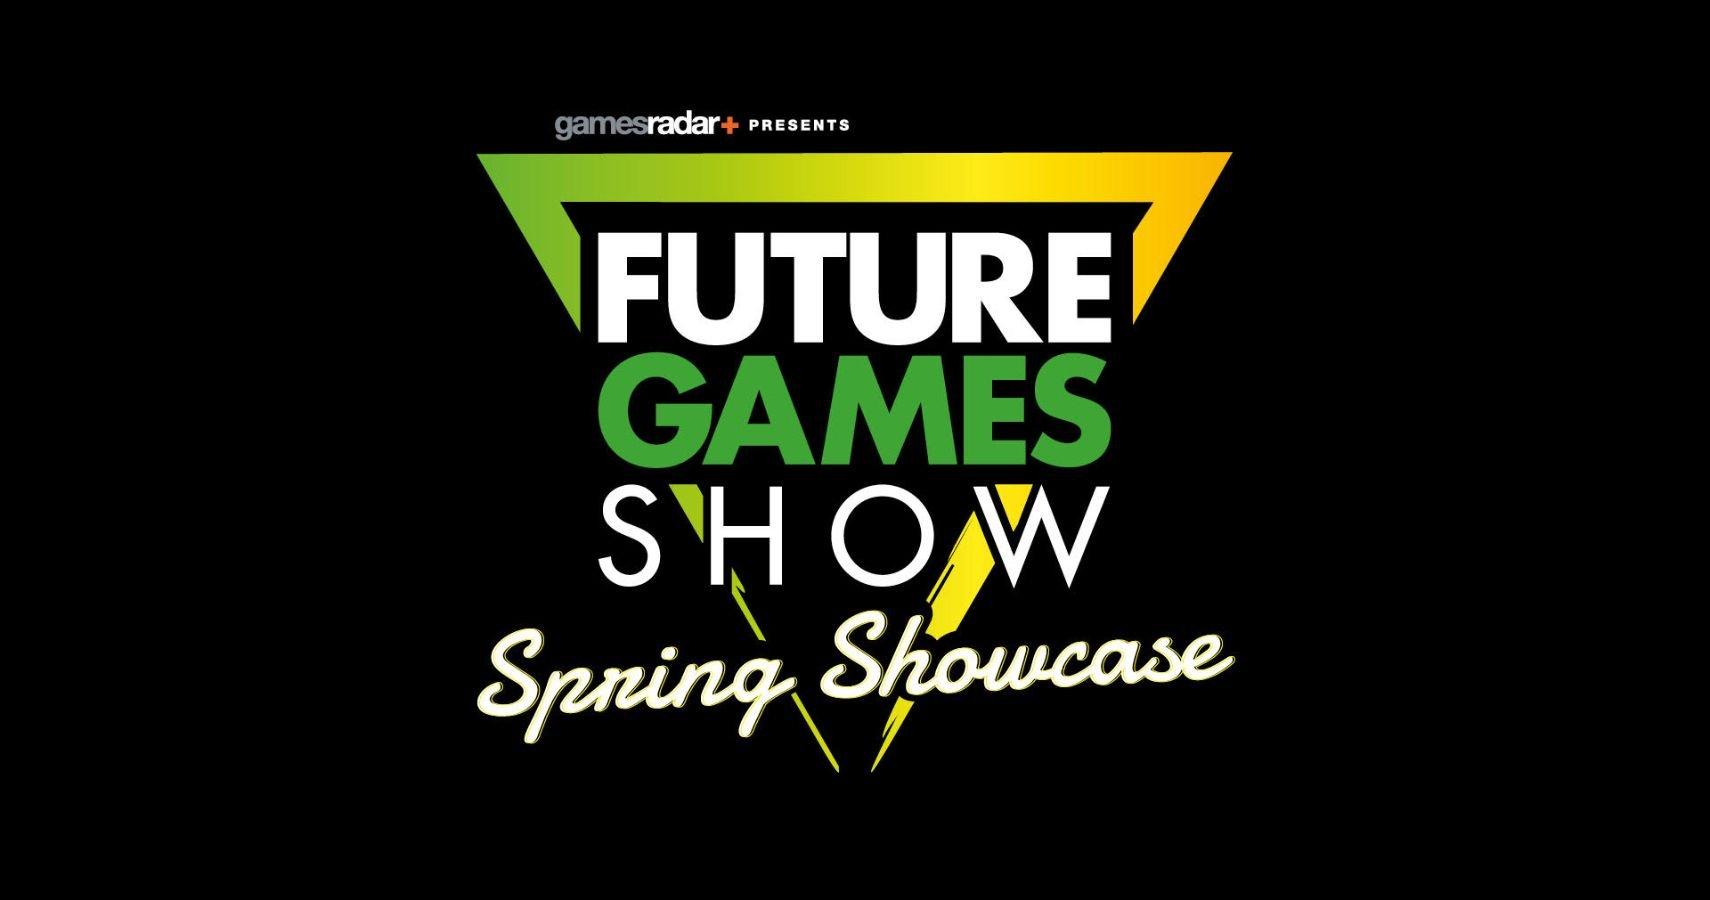 Future-Games-Show-Spring-Showcase